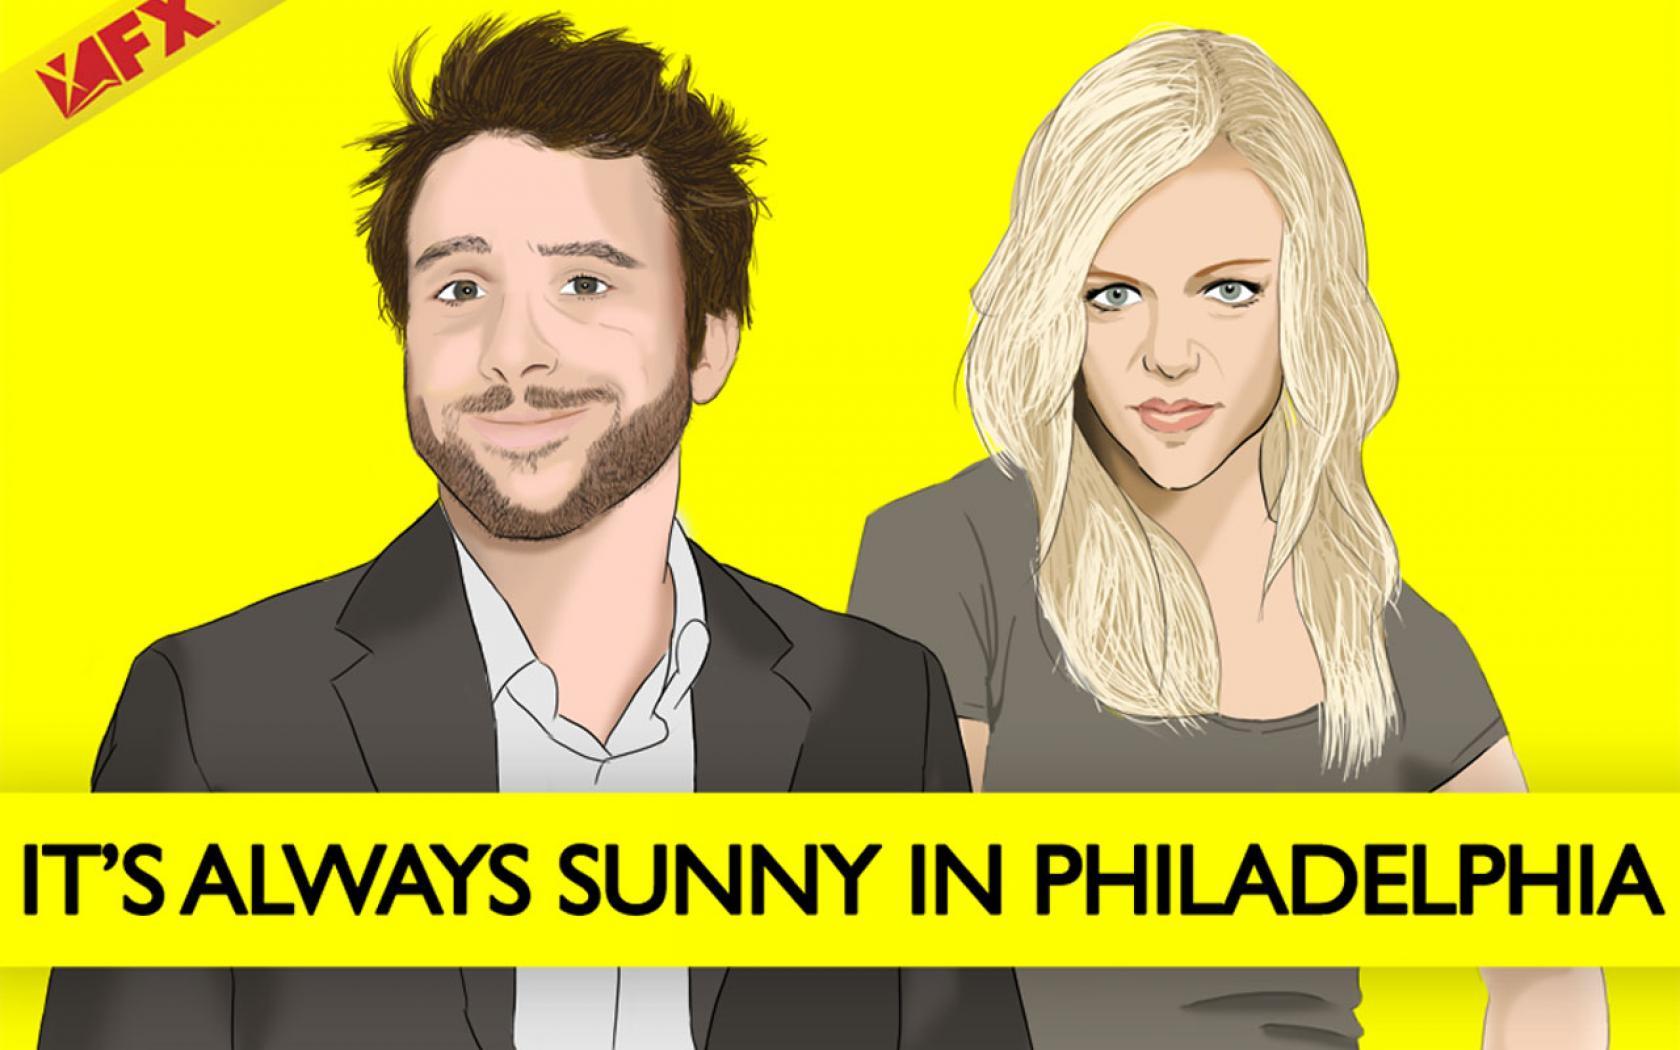 its always sunny in philadelphia yellow background #Qx1y